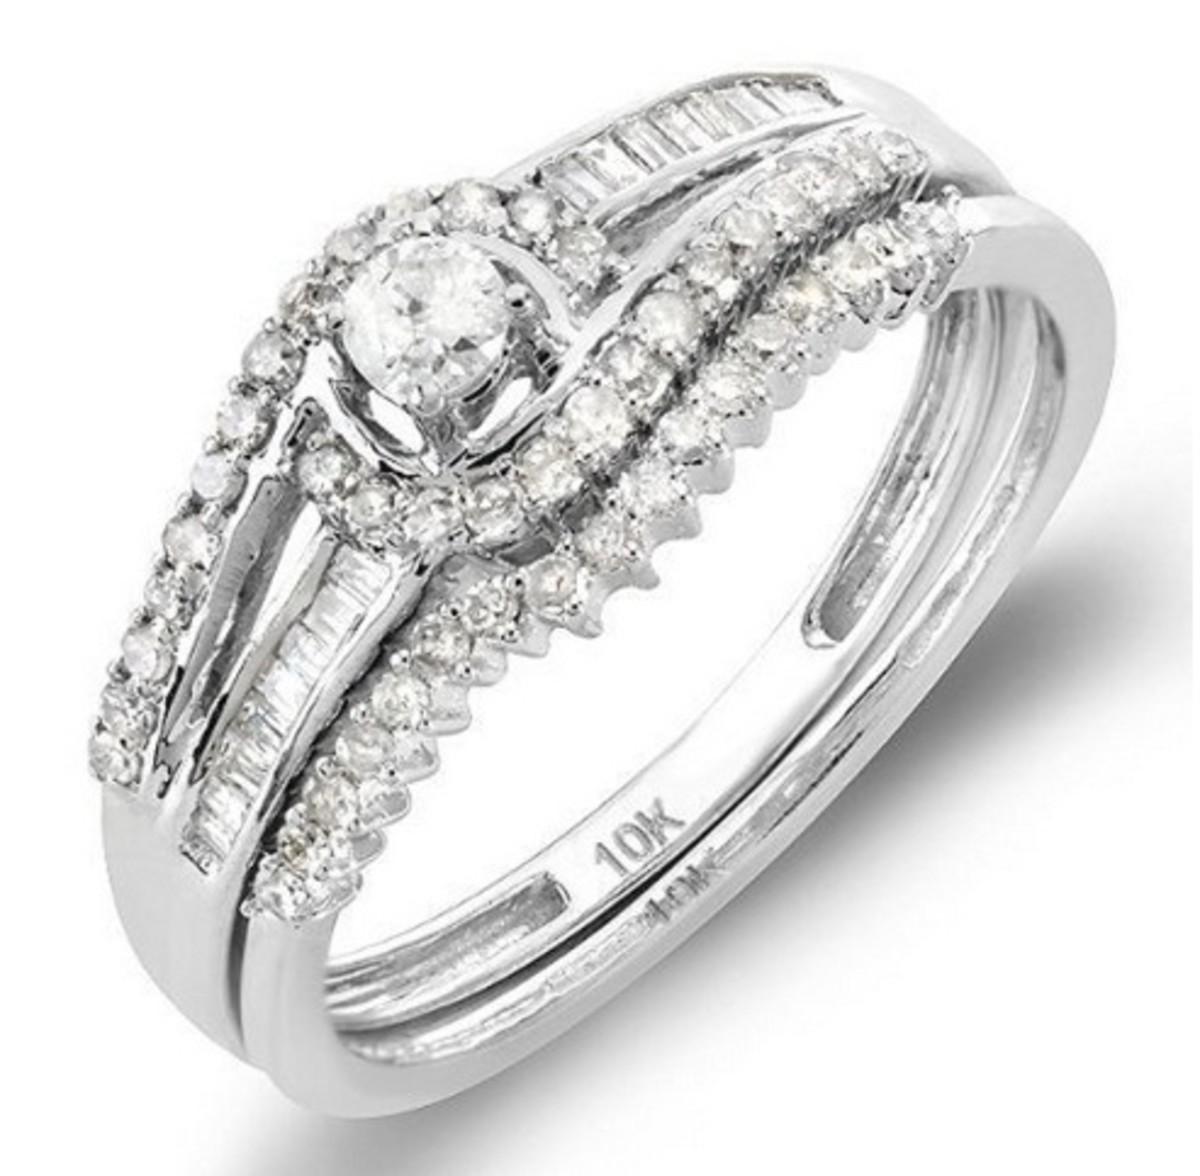 10k White Gold Round & Baguette Diamond Halo Bridal Ring Set